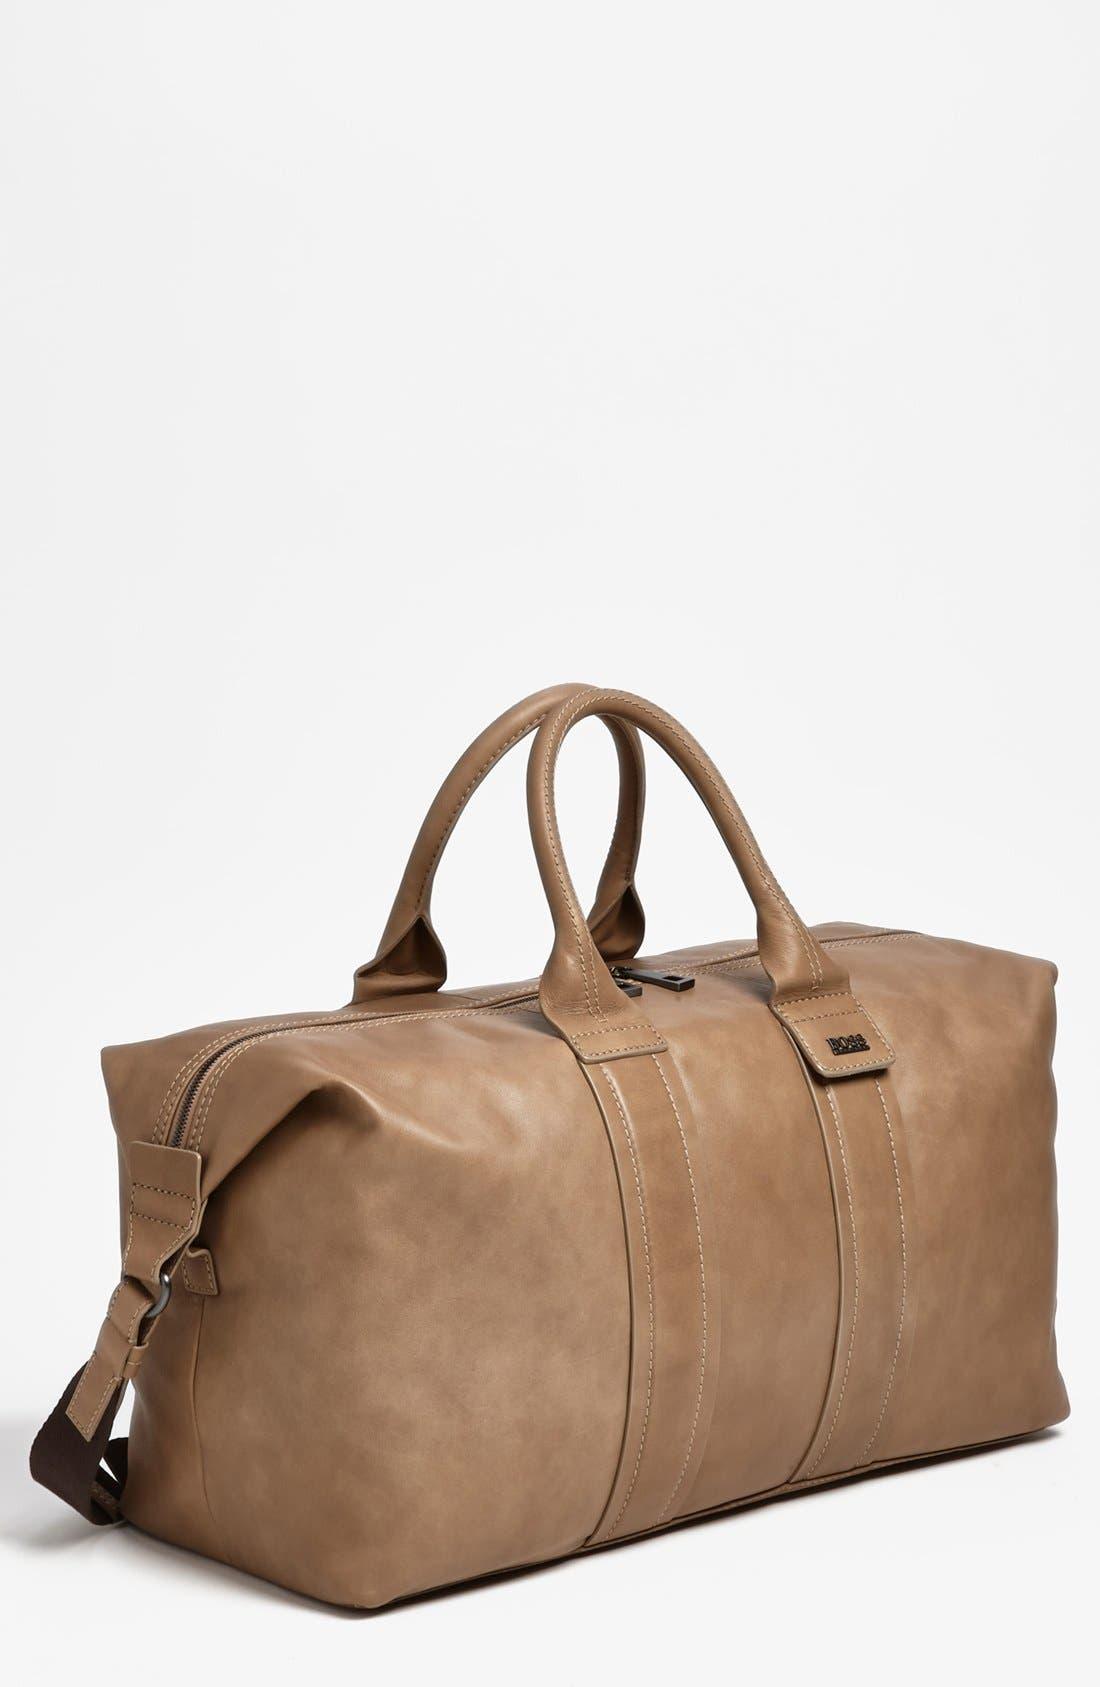 HUGO BOSS 'Sunset' Bag, Main, color, 270